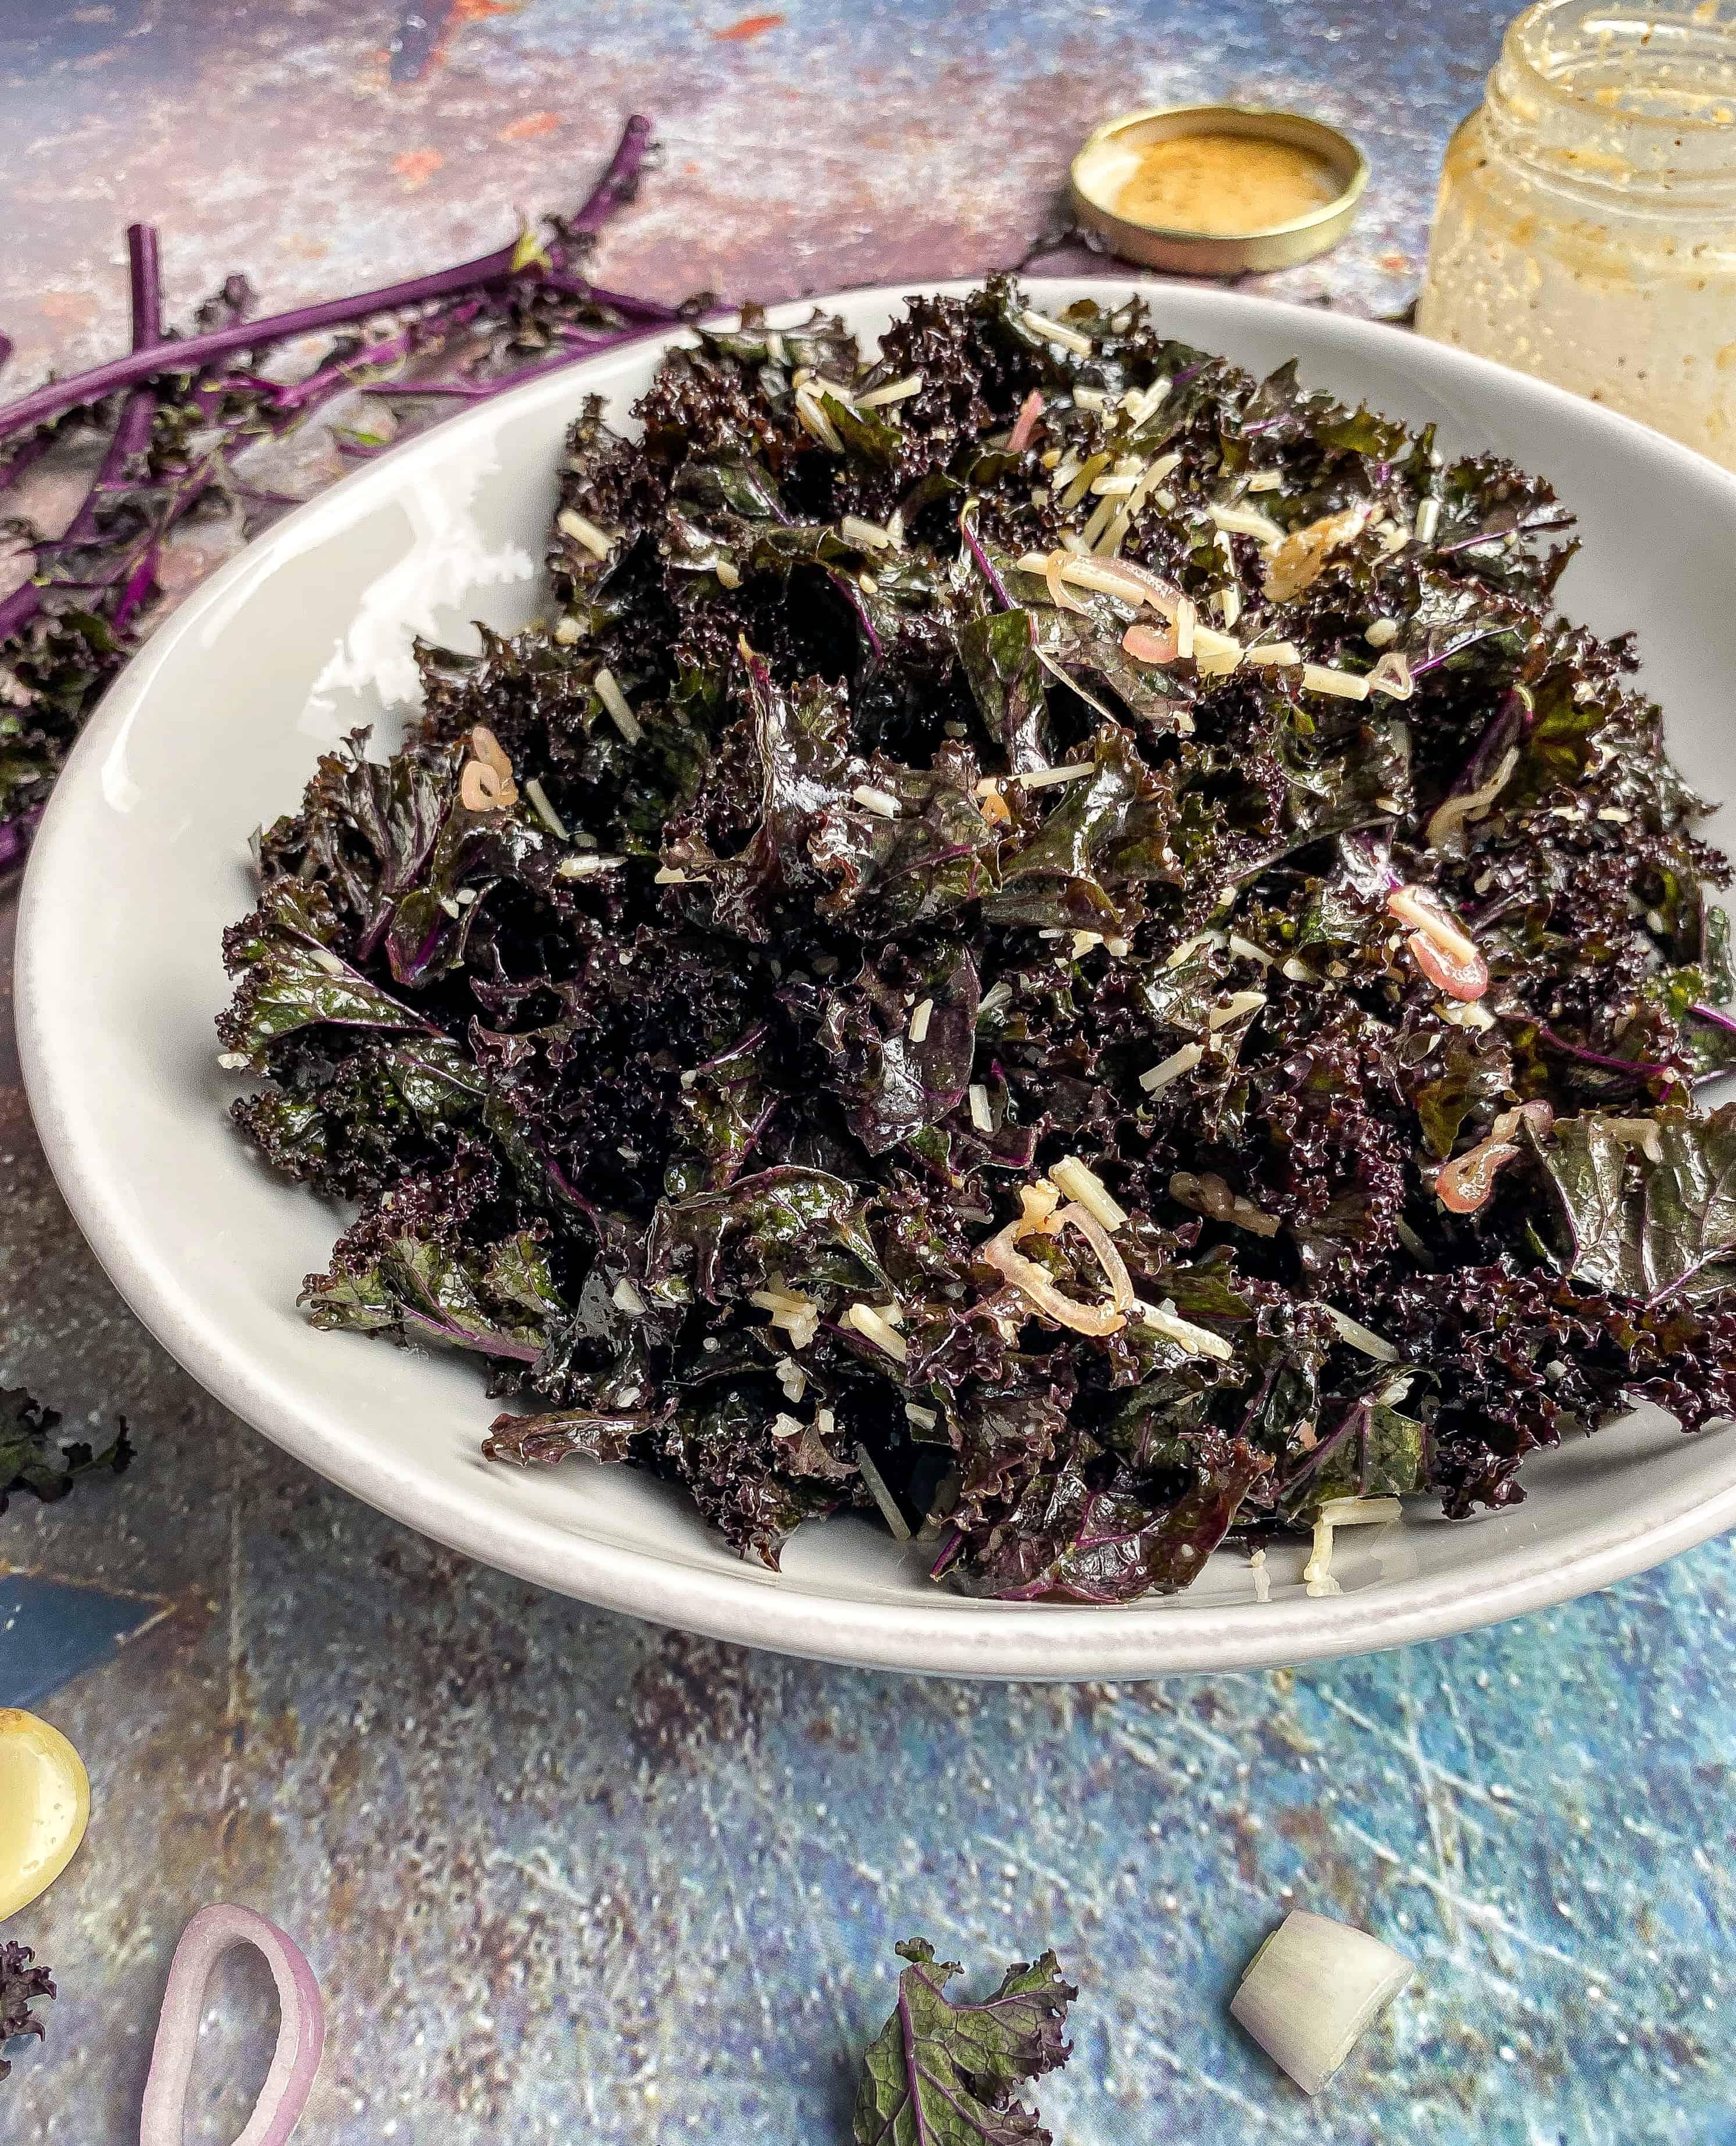 Kale Salad with Parmesan & Shallot Dijon Dressing